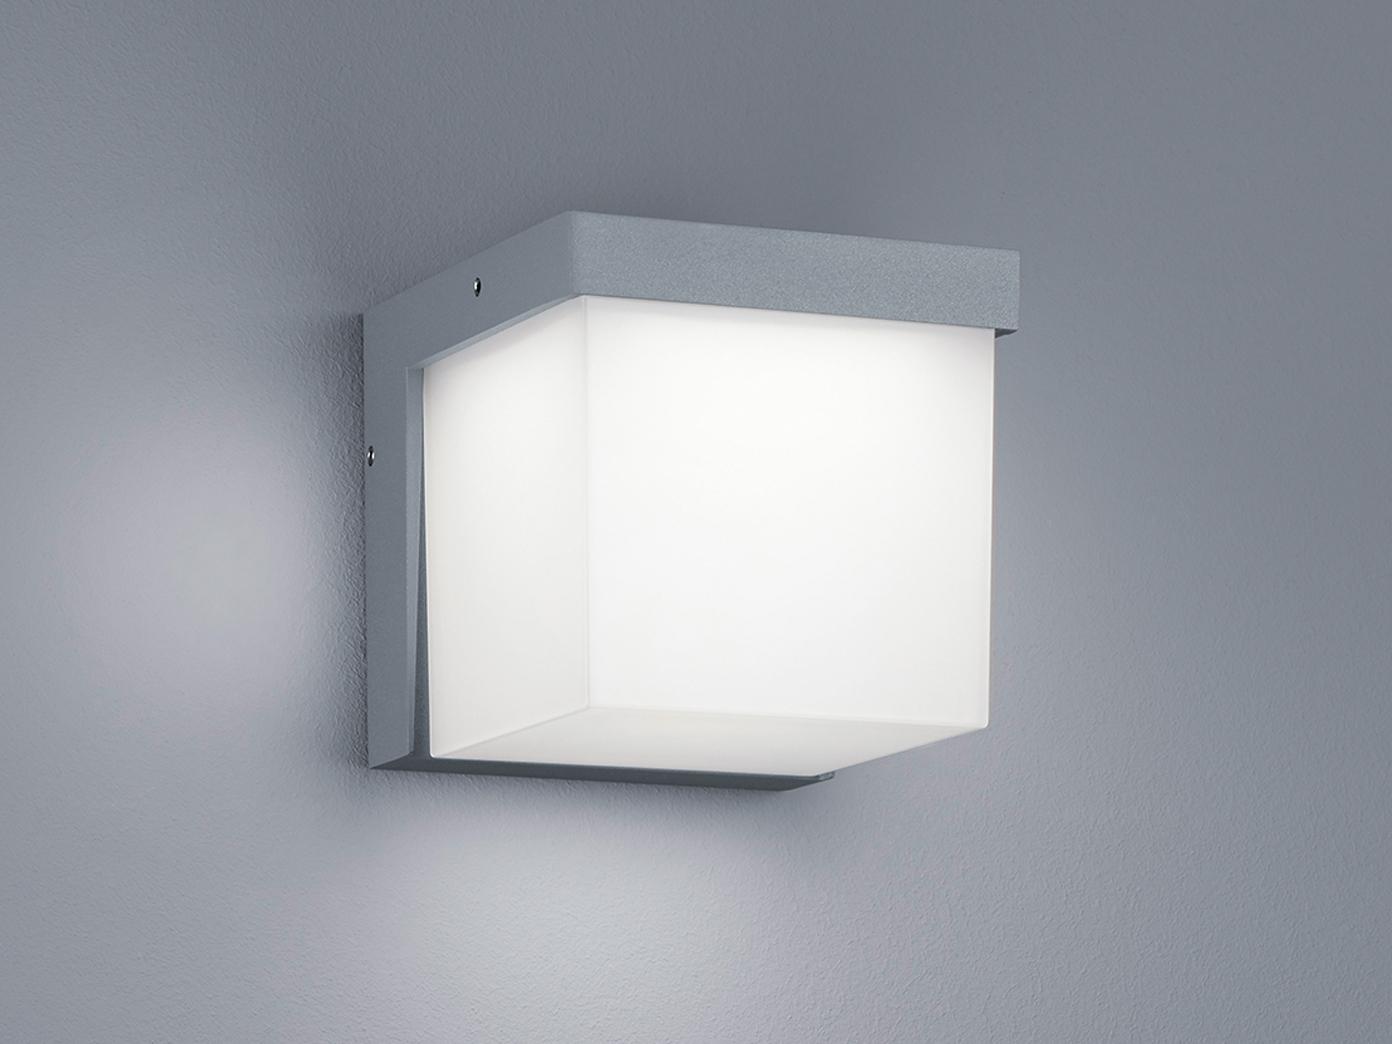 terrassenbeleuchtung mehr als 100 angebote fotos preise. Black Bedroom Furniture Sets. Home Design Ideas